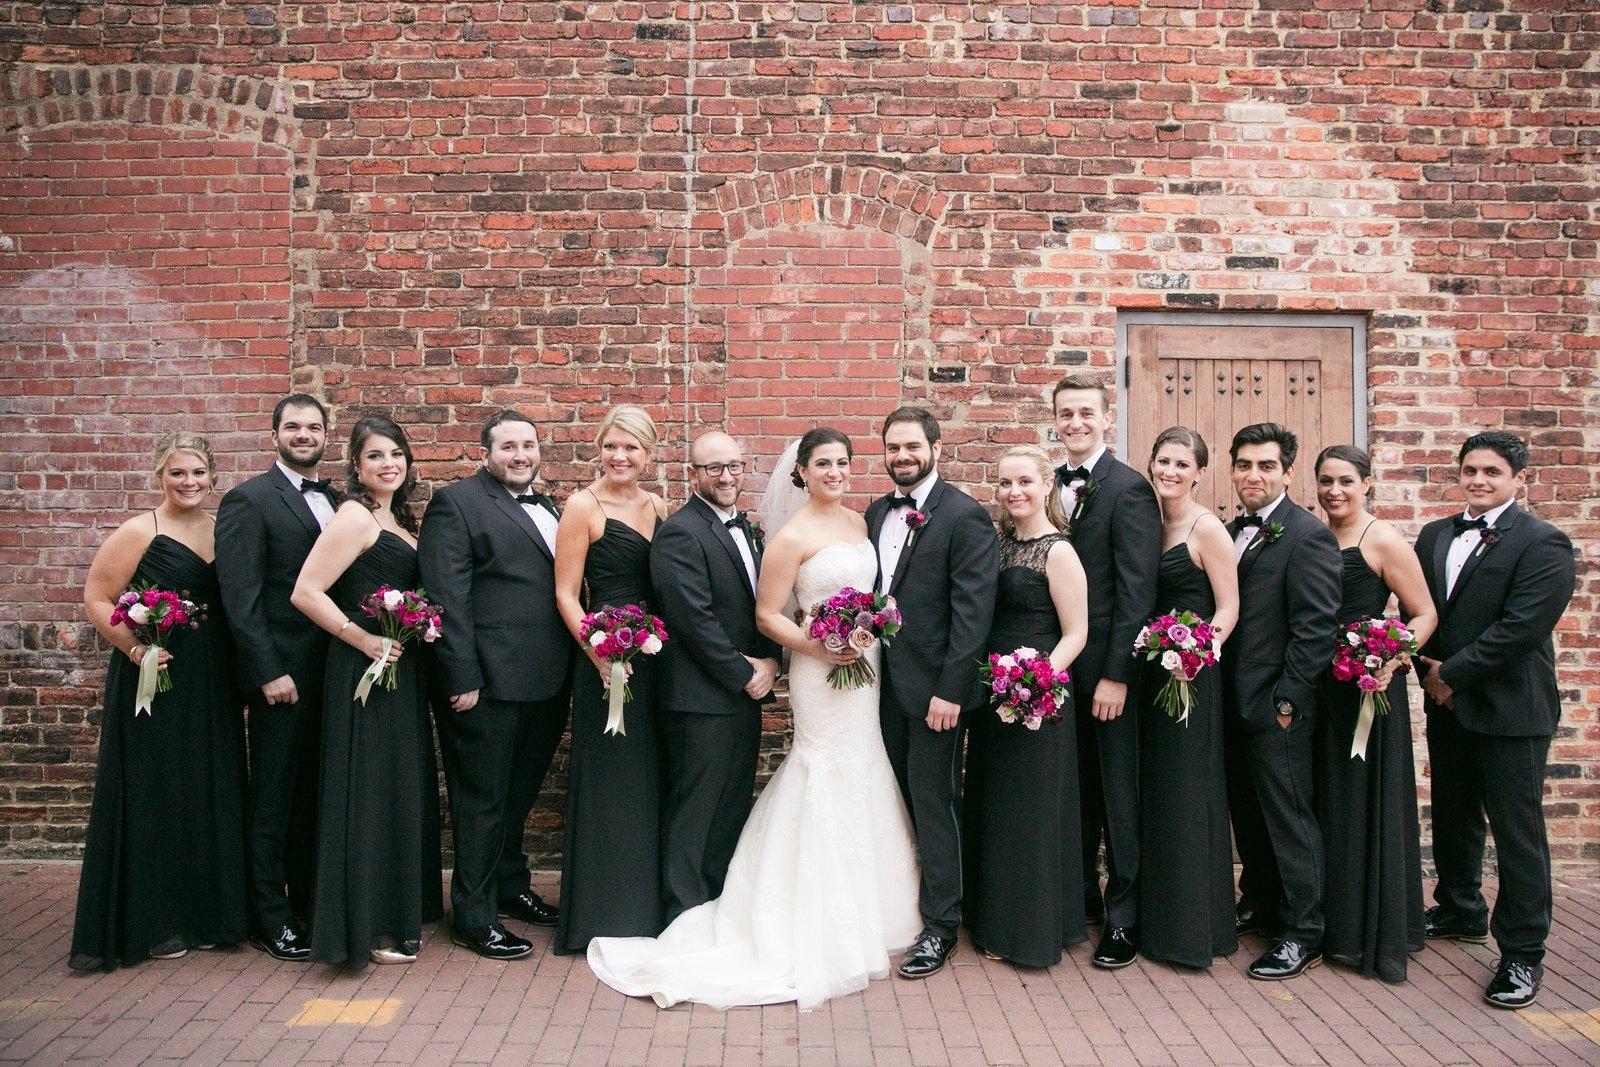 Black-tie-wedding-photos-longview-gallery-dc (167)